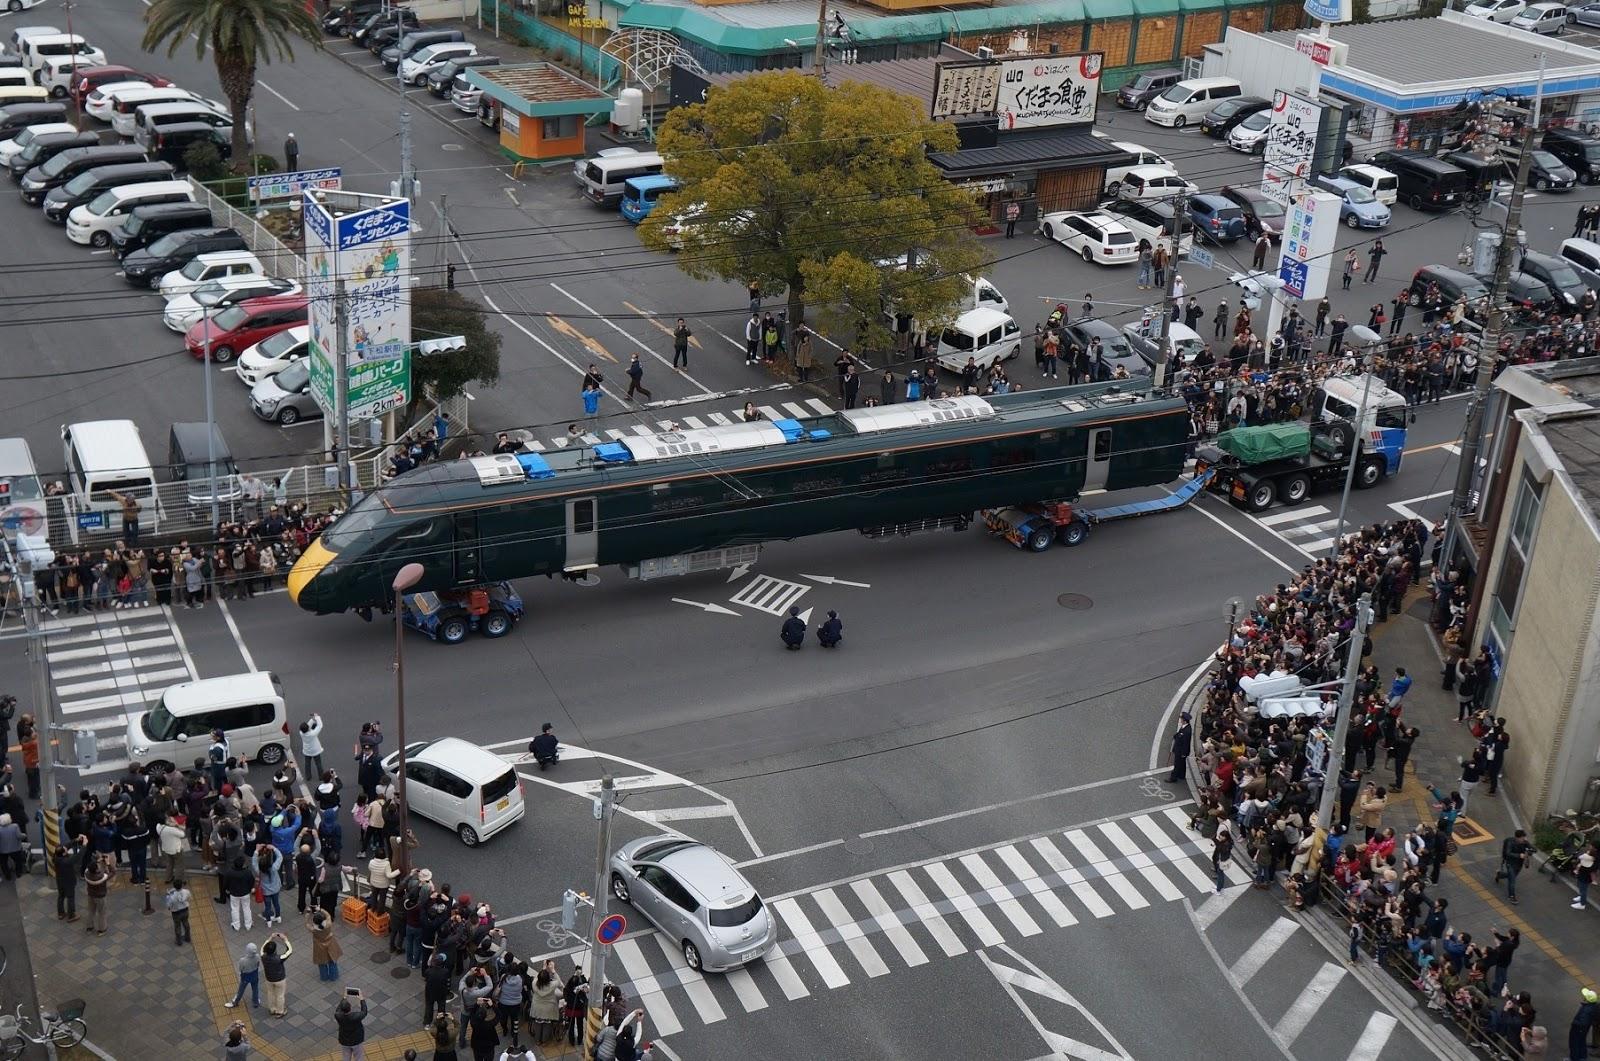 https://image.itmedia.co.jp/nl/articles/1906/12/l_tsuru_kudamatsu_003_.jpg